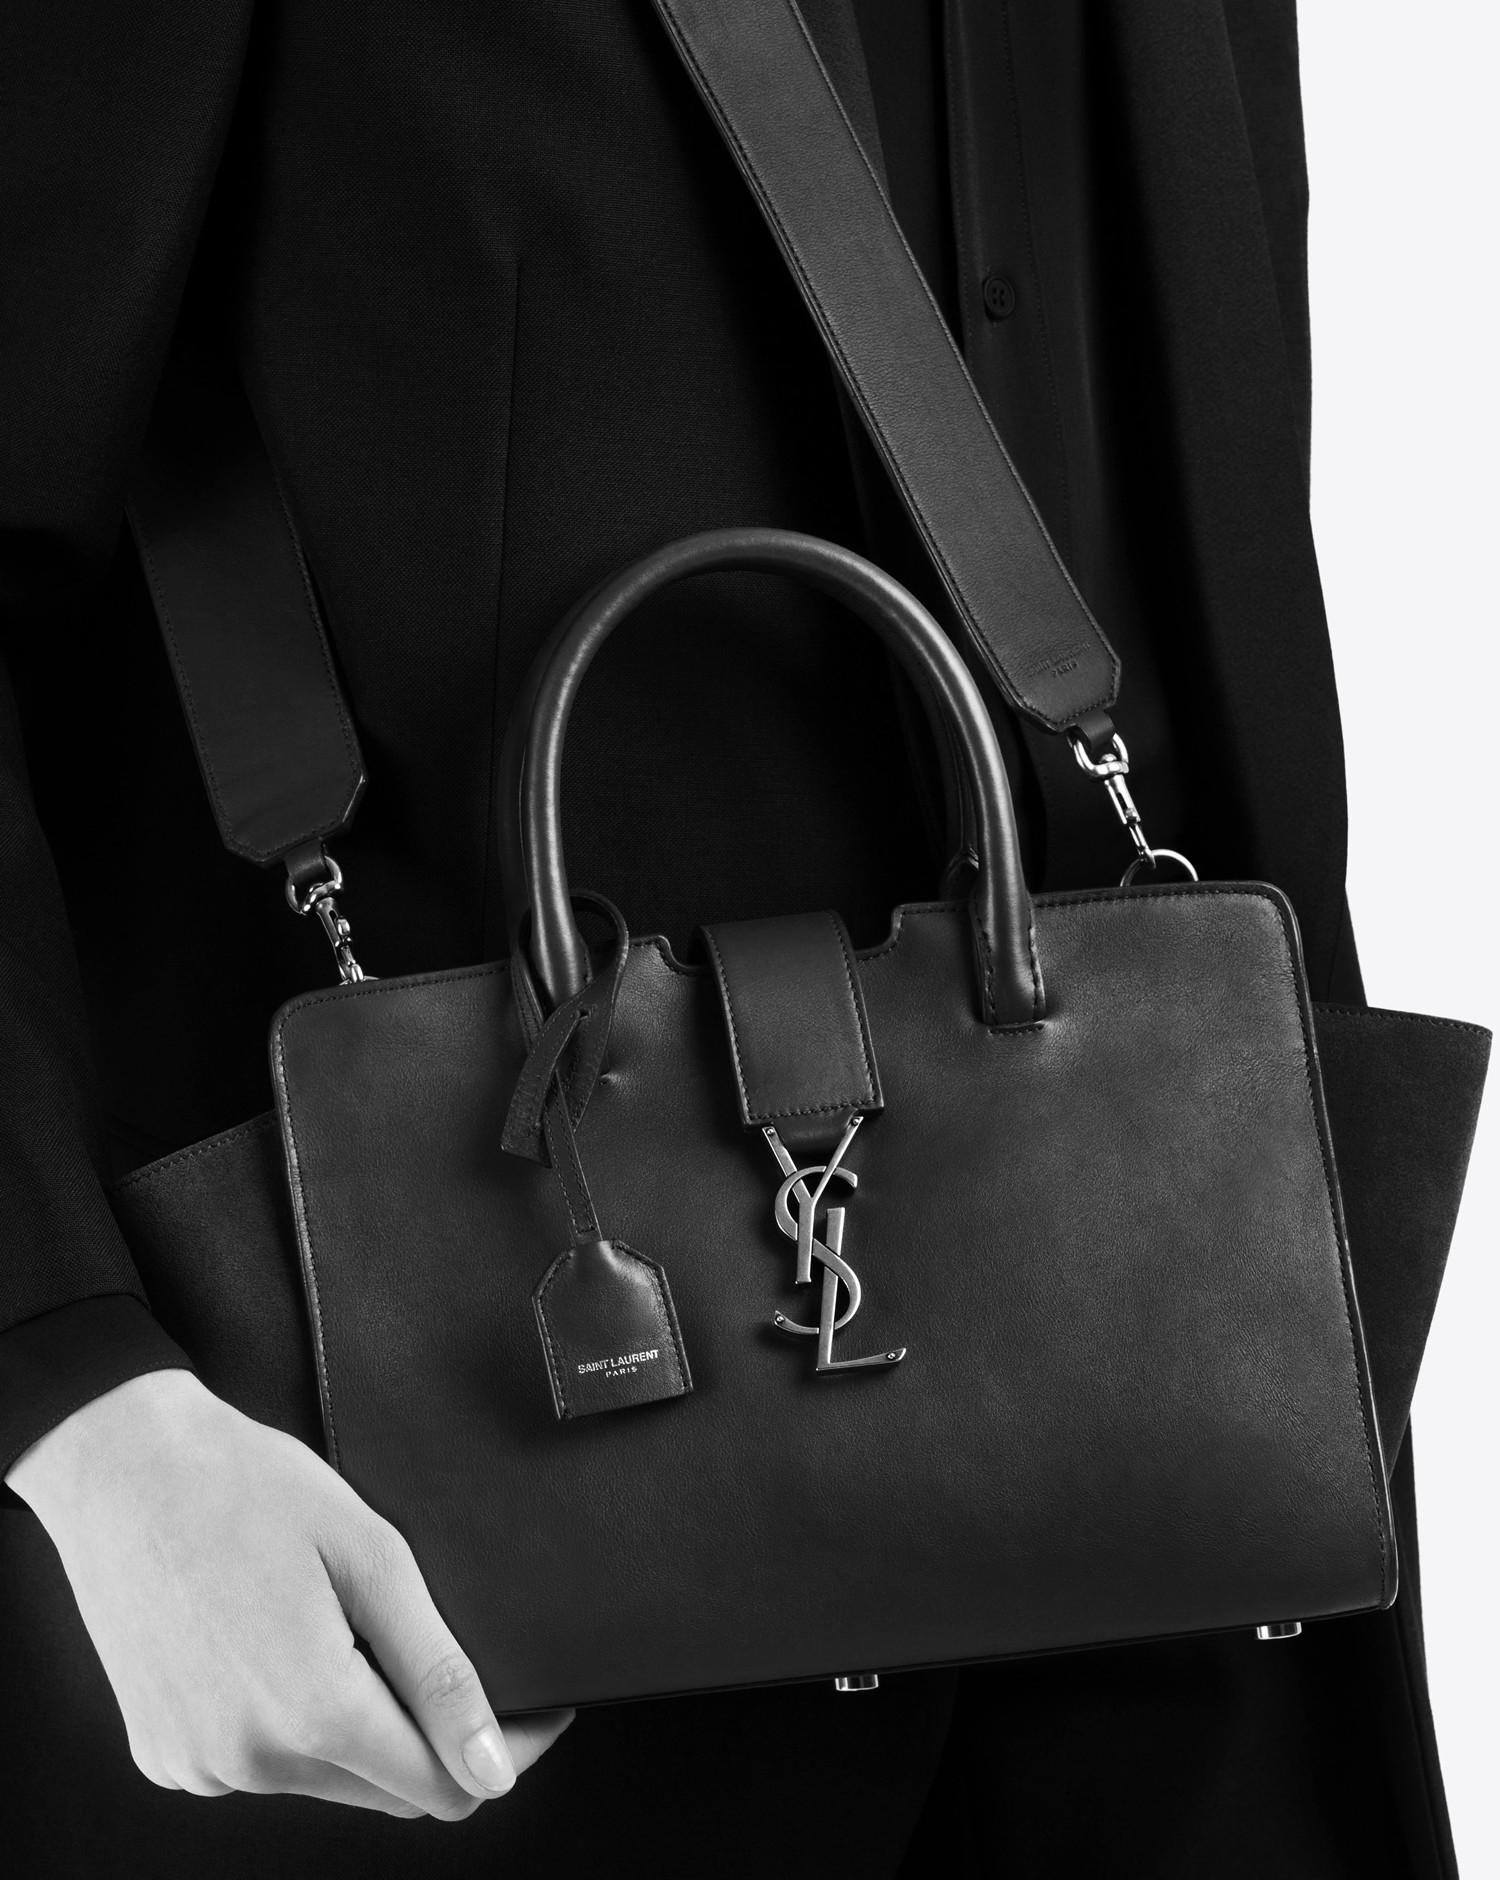 Lyst - Saint Laurent Baby Monogram Downtown Cabas Bag In Ultramarine ... 937fcfdd719b3